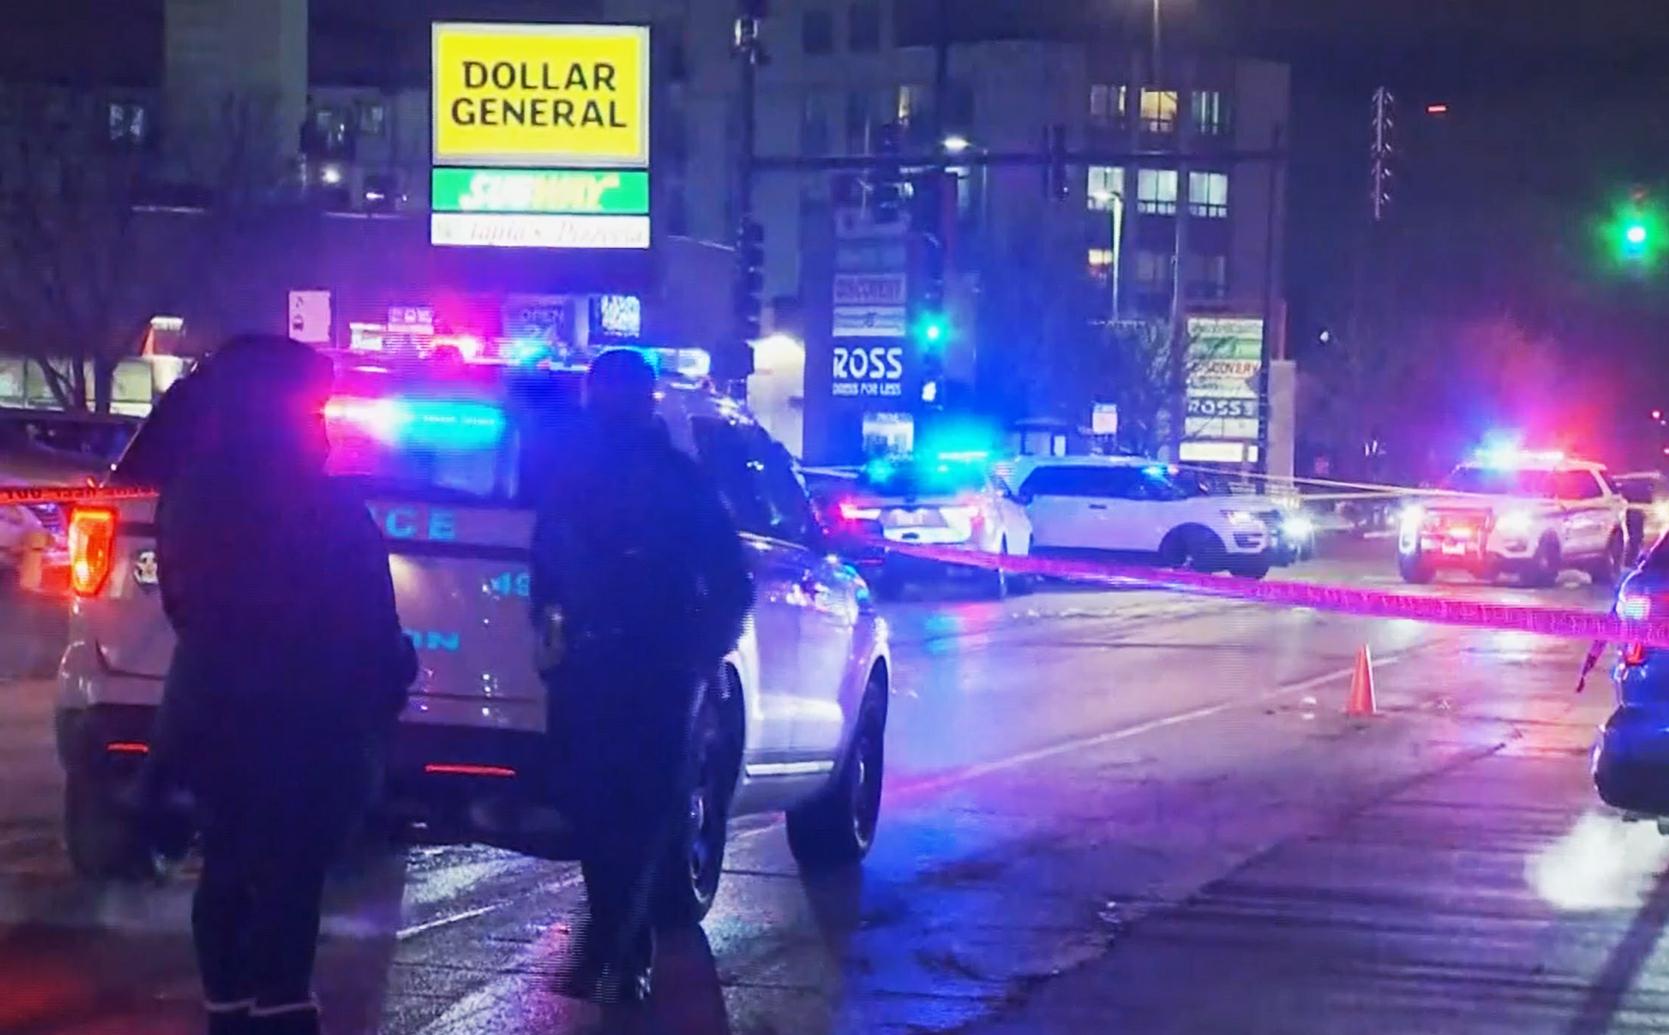 Gunman on 'murderous rampage' leaves at least three dead in Illinois